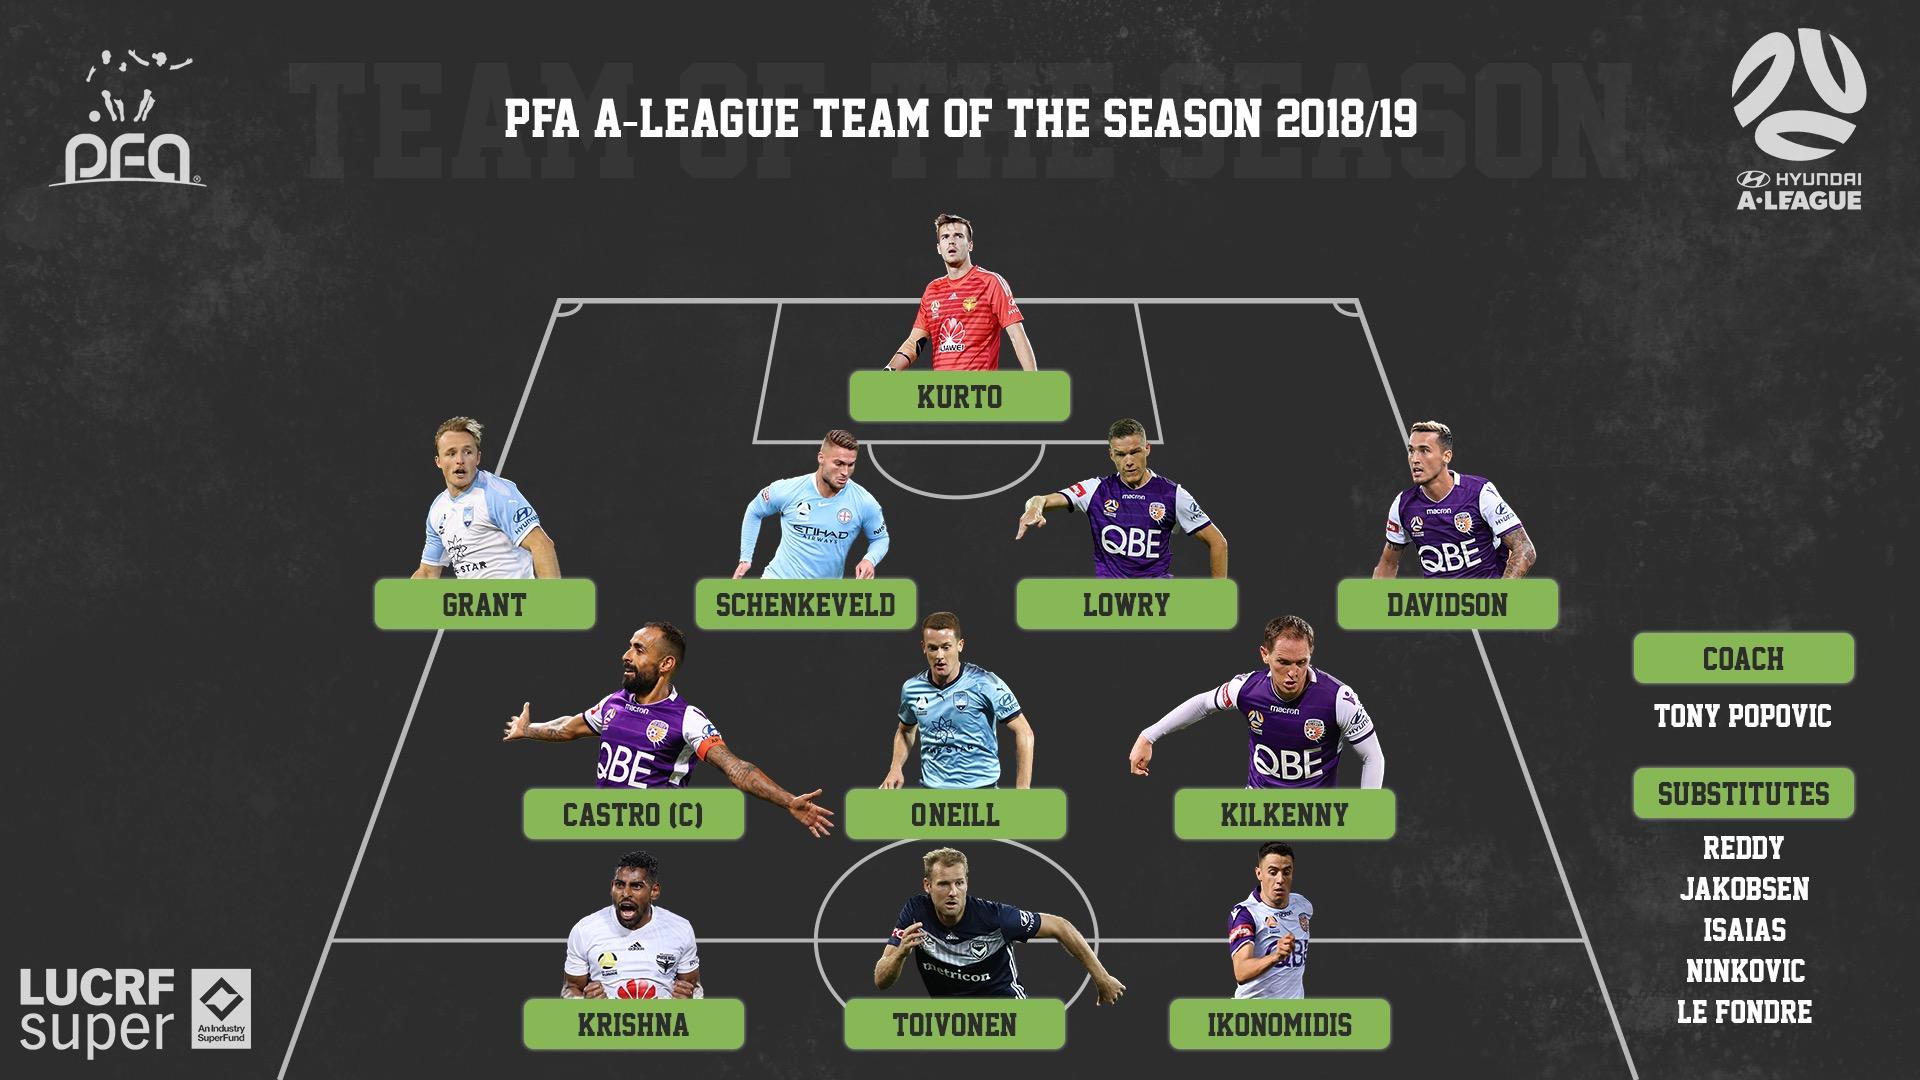 PFA Team of the Season - Professional Footballers Australia